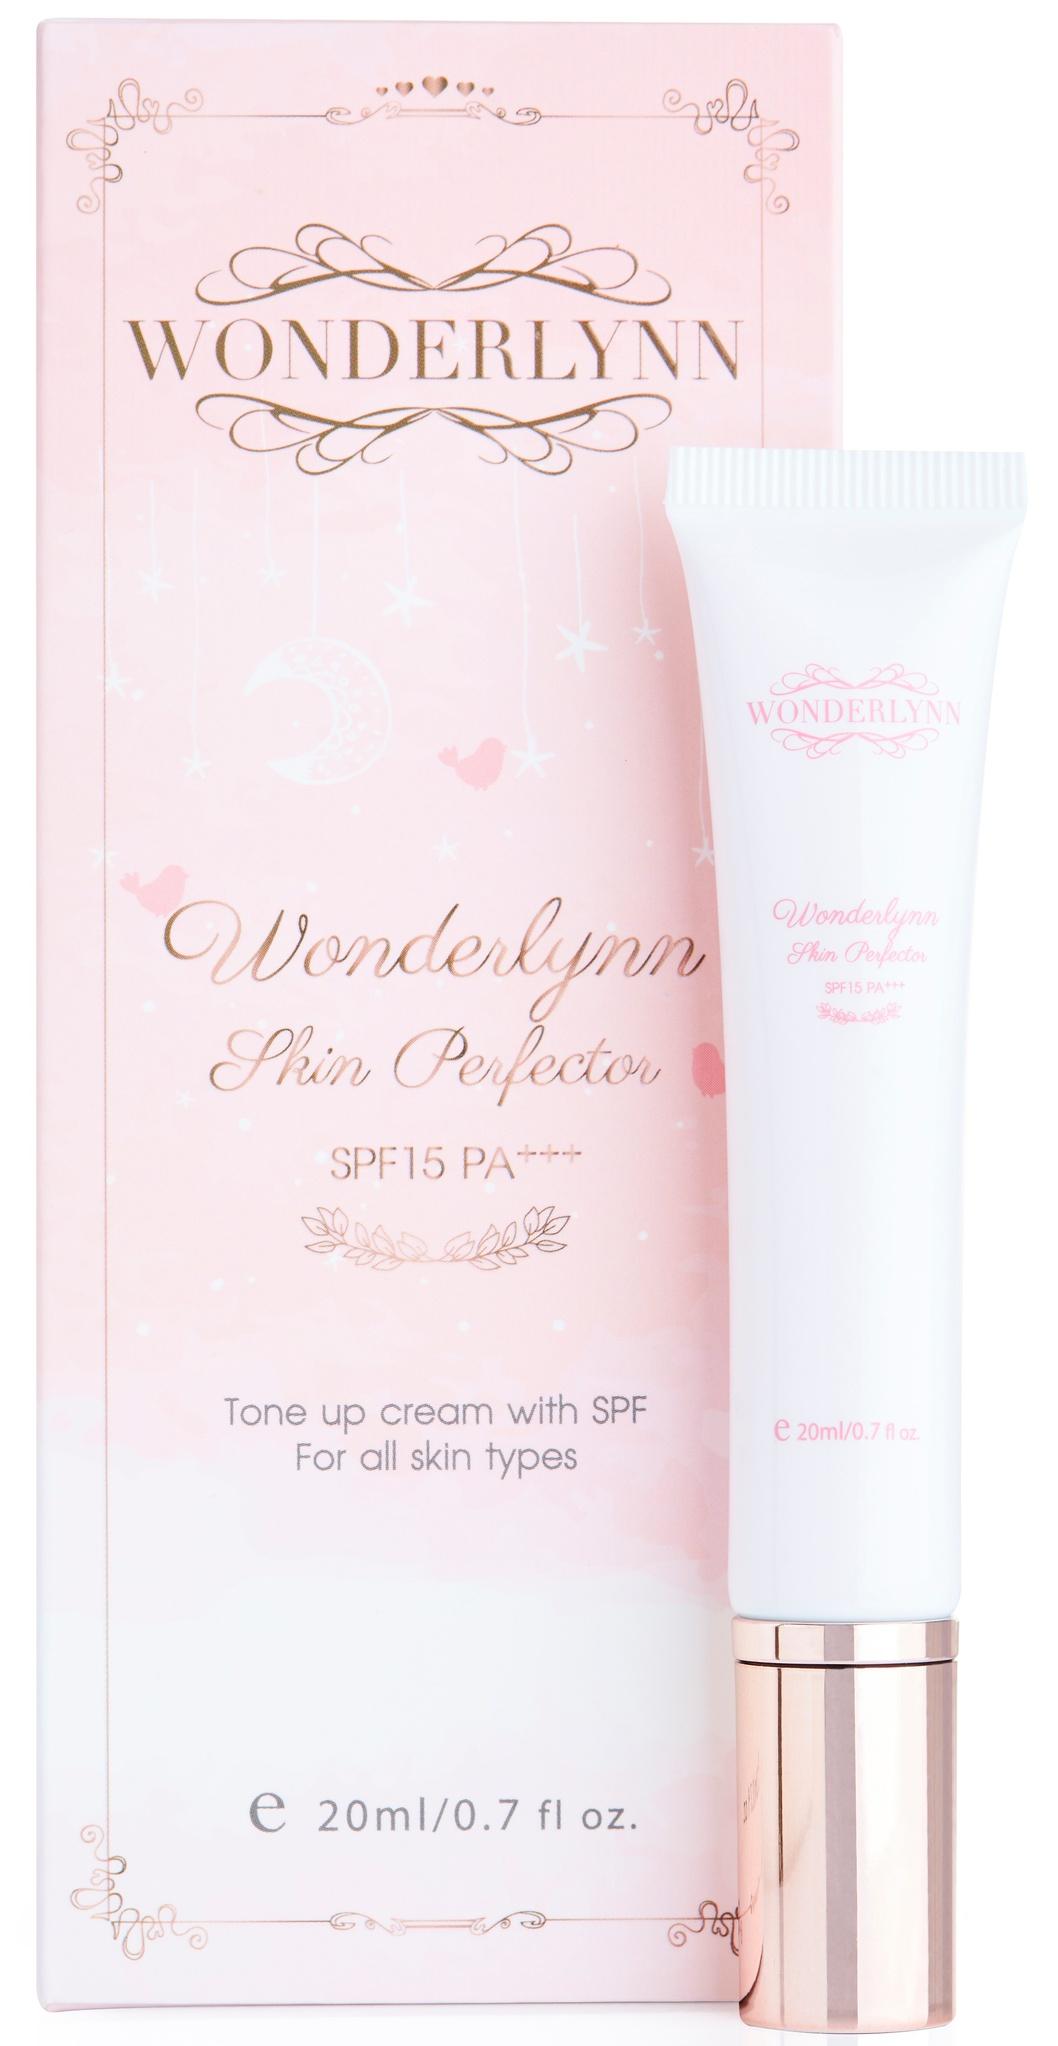 WONDERLYNN Skin Perfector SPF15 Pa+++